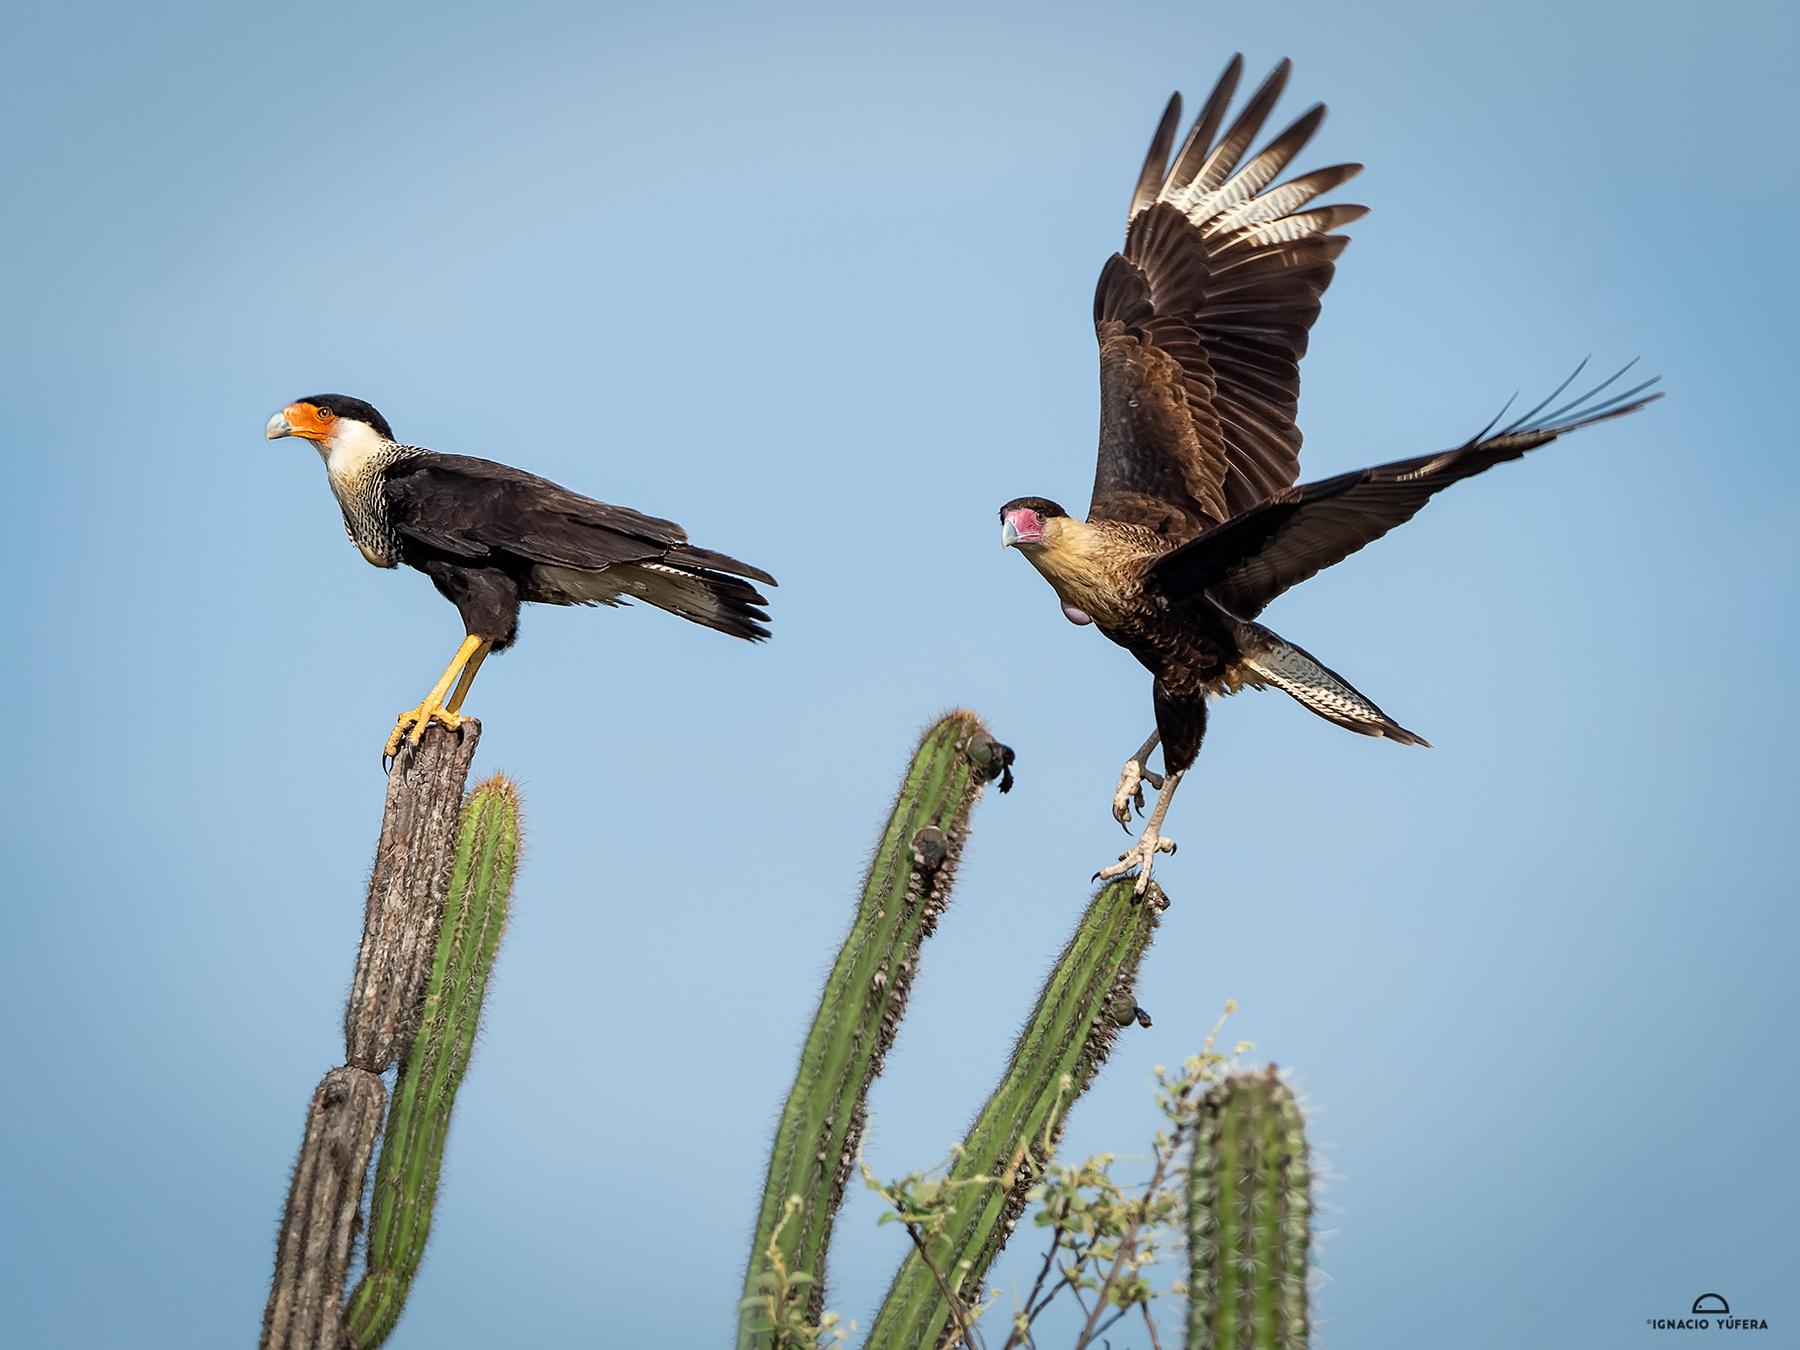 Crested Caracara (Caracara cheriguay), adult and juvenile, La Guajira, Colombia